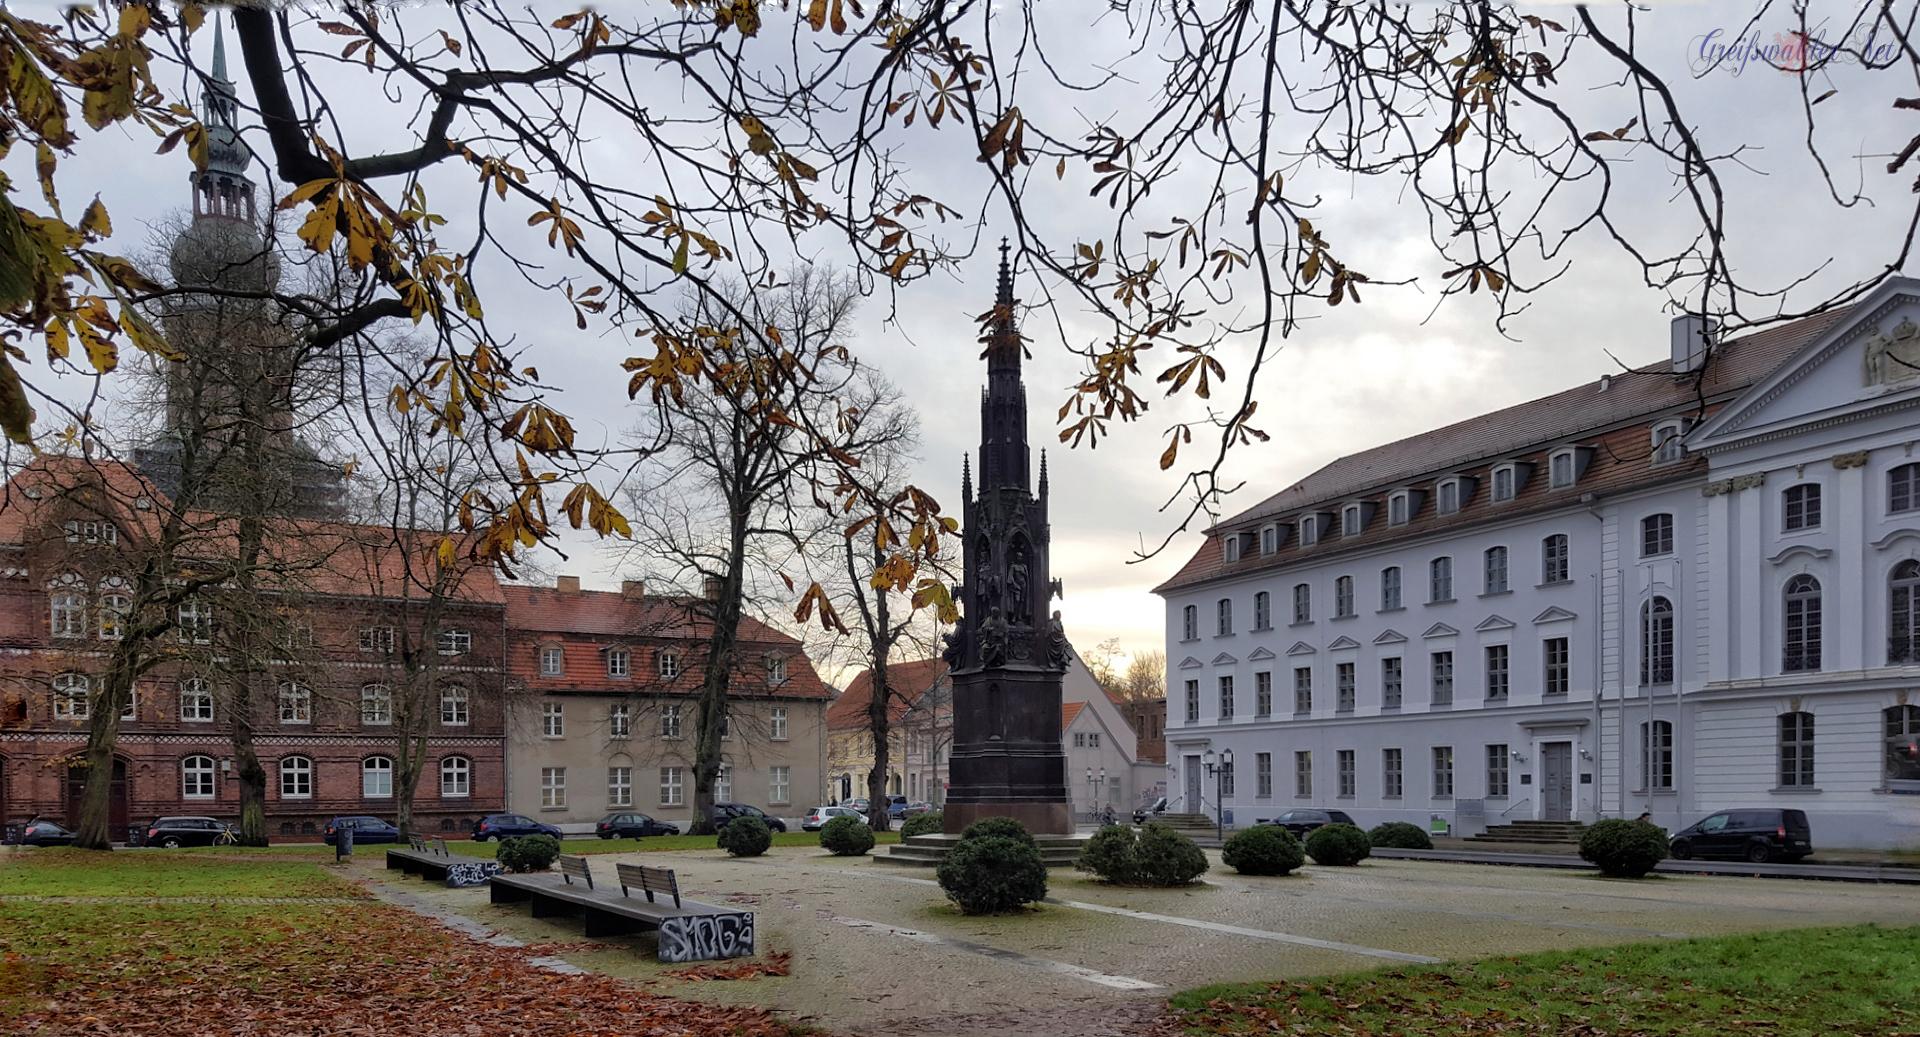 Rubenowplatz in Greifswald